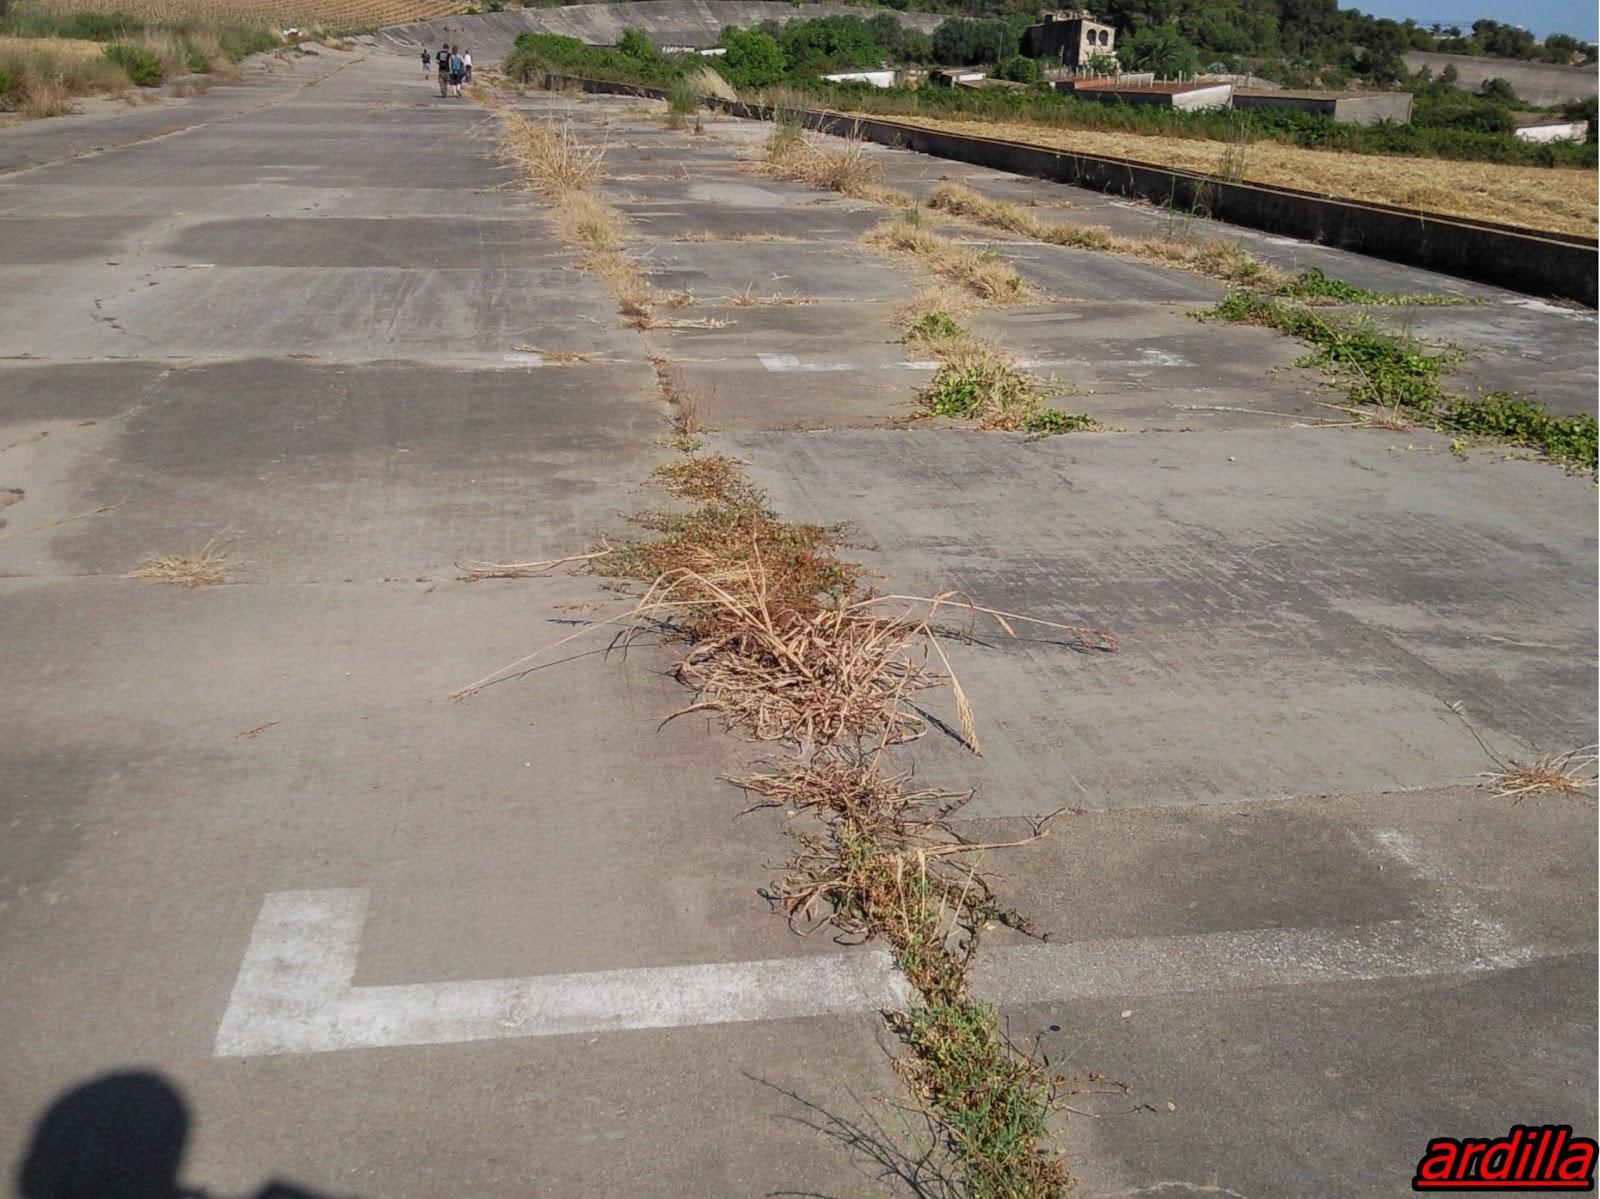 Circuito Terramar : Urbex la brujula de los abandonos circuito de terramar